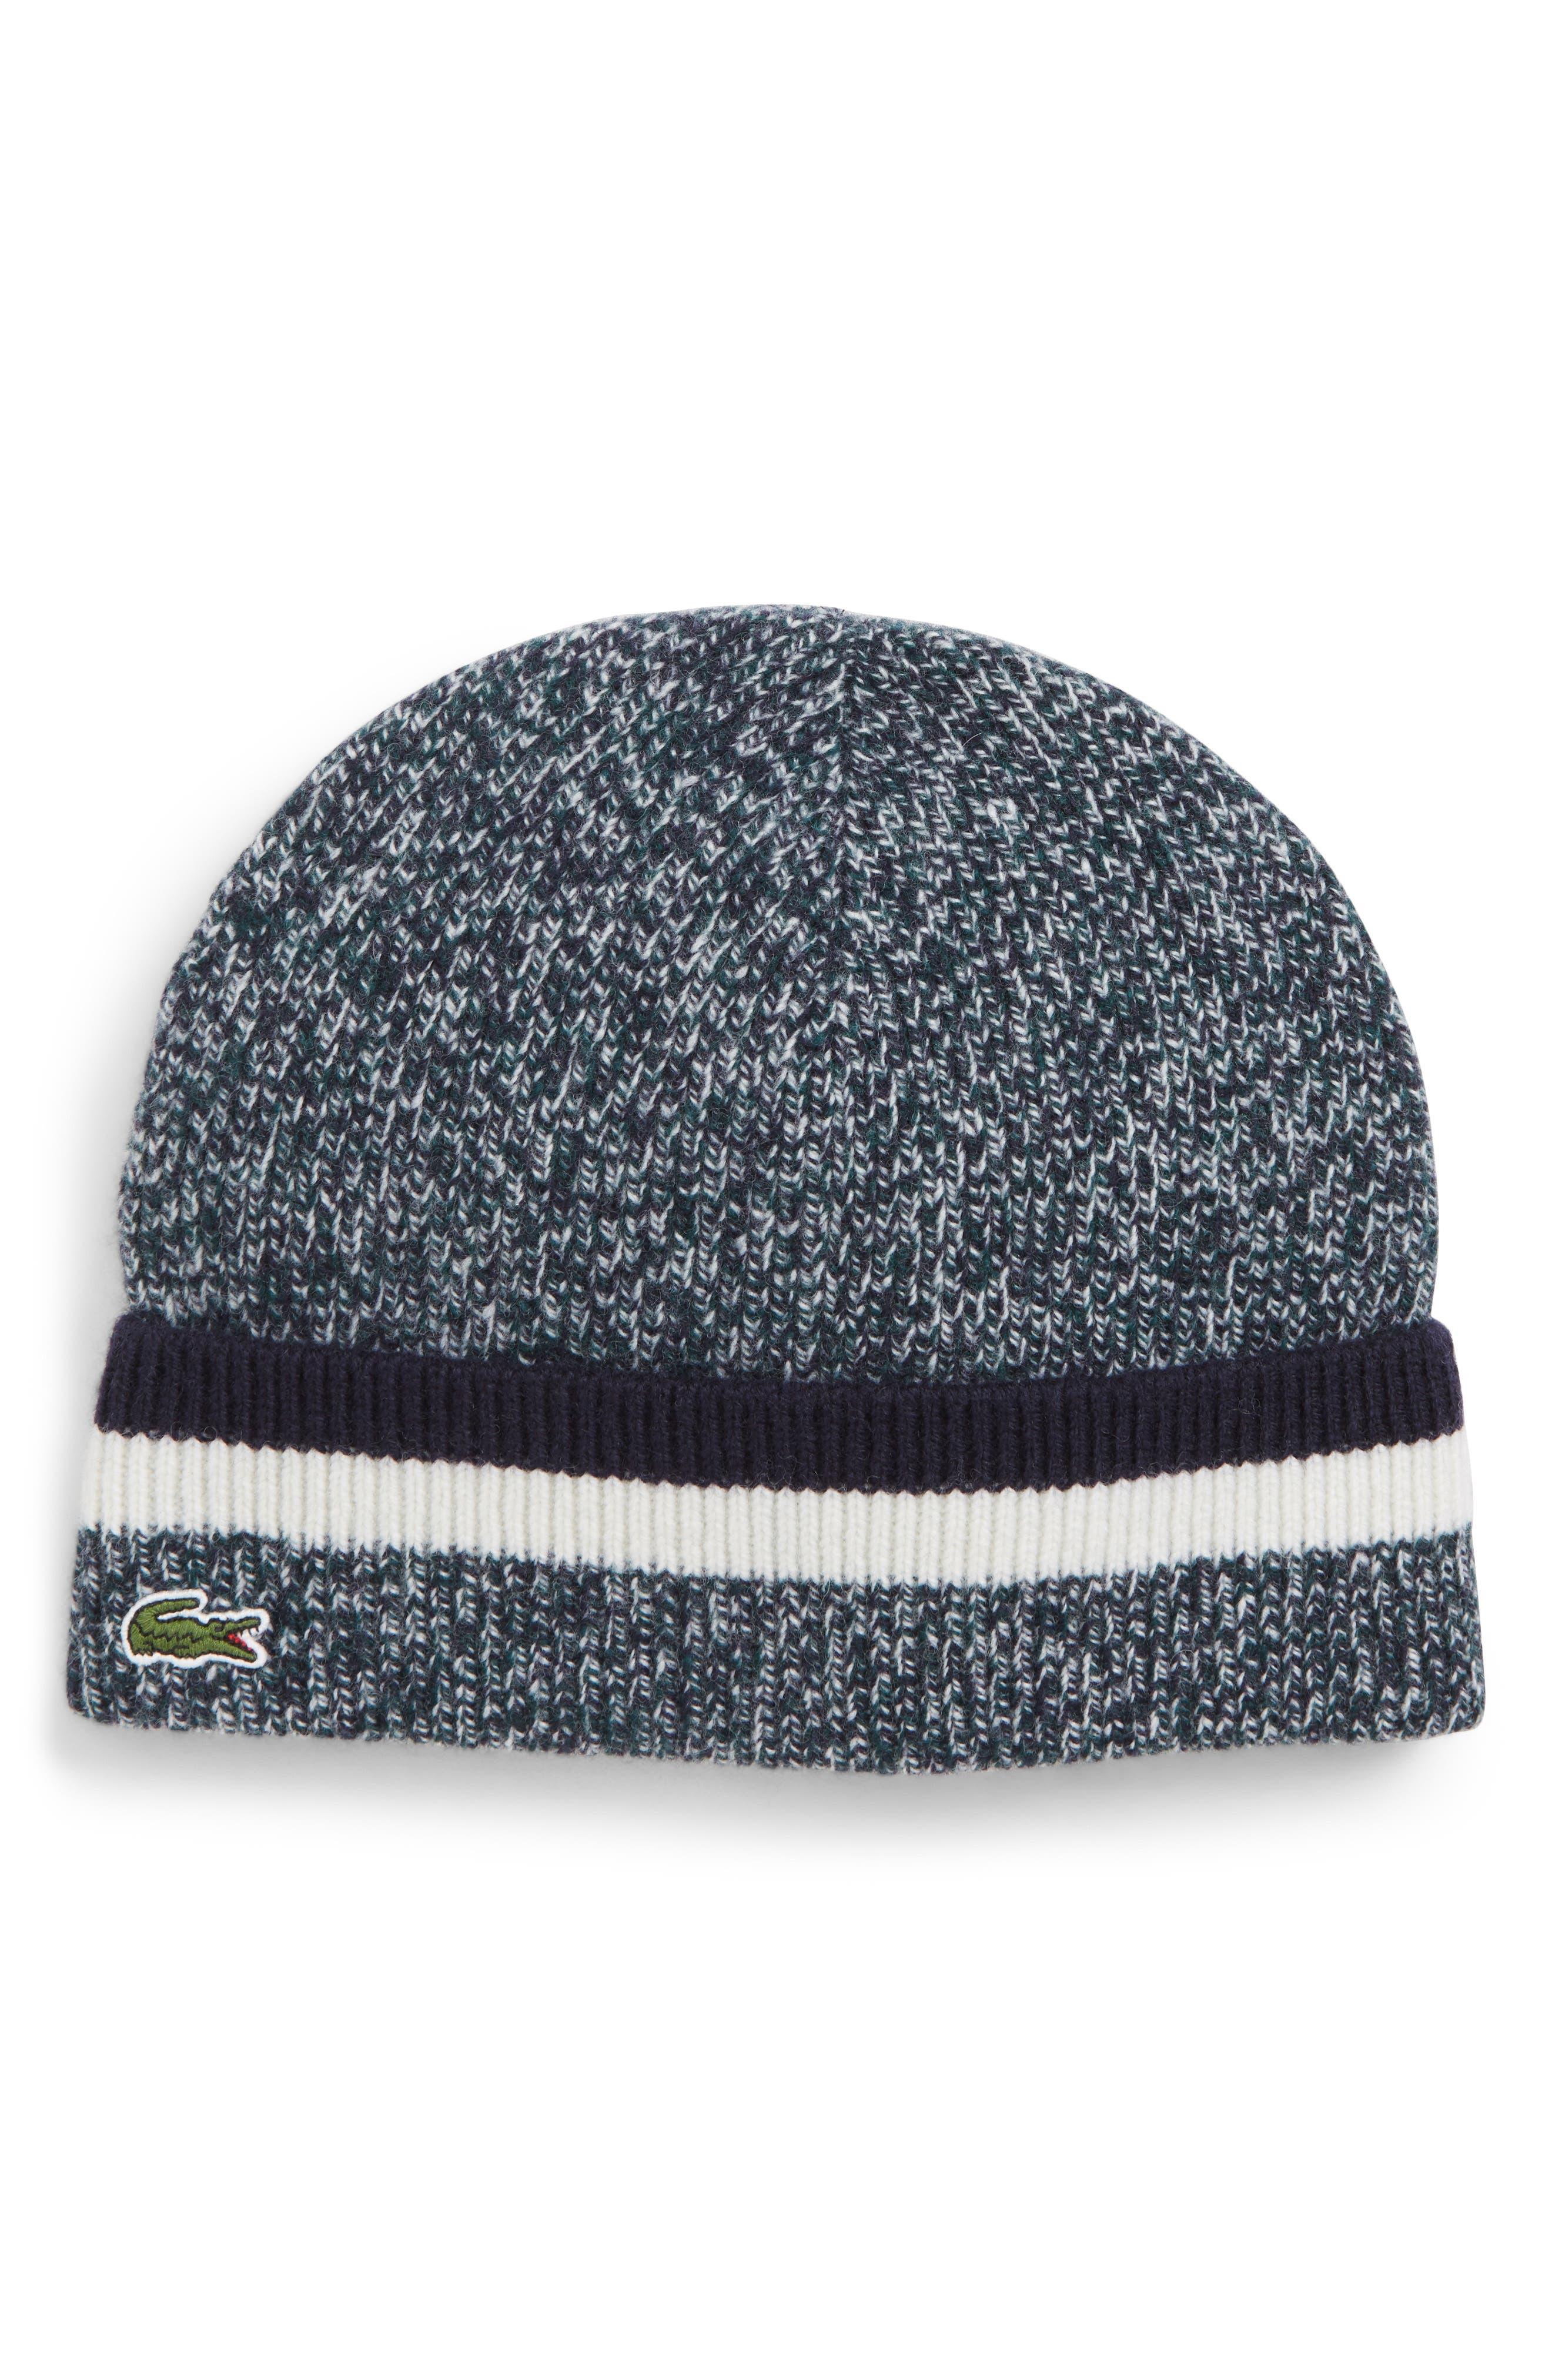 1c305704dcdc3 Scarves Nordstrom Hats amp  Lacoste Men s Gloves BZHRx